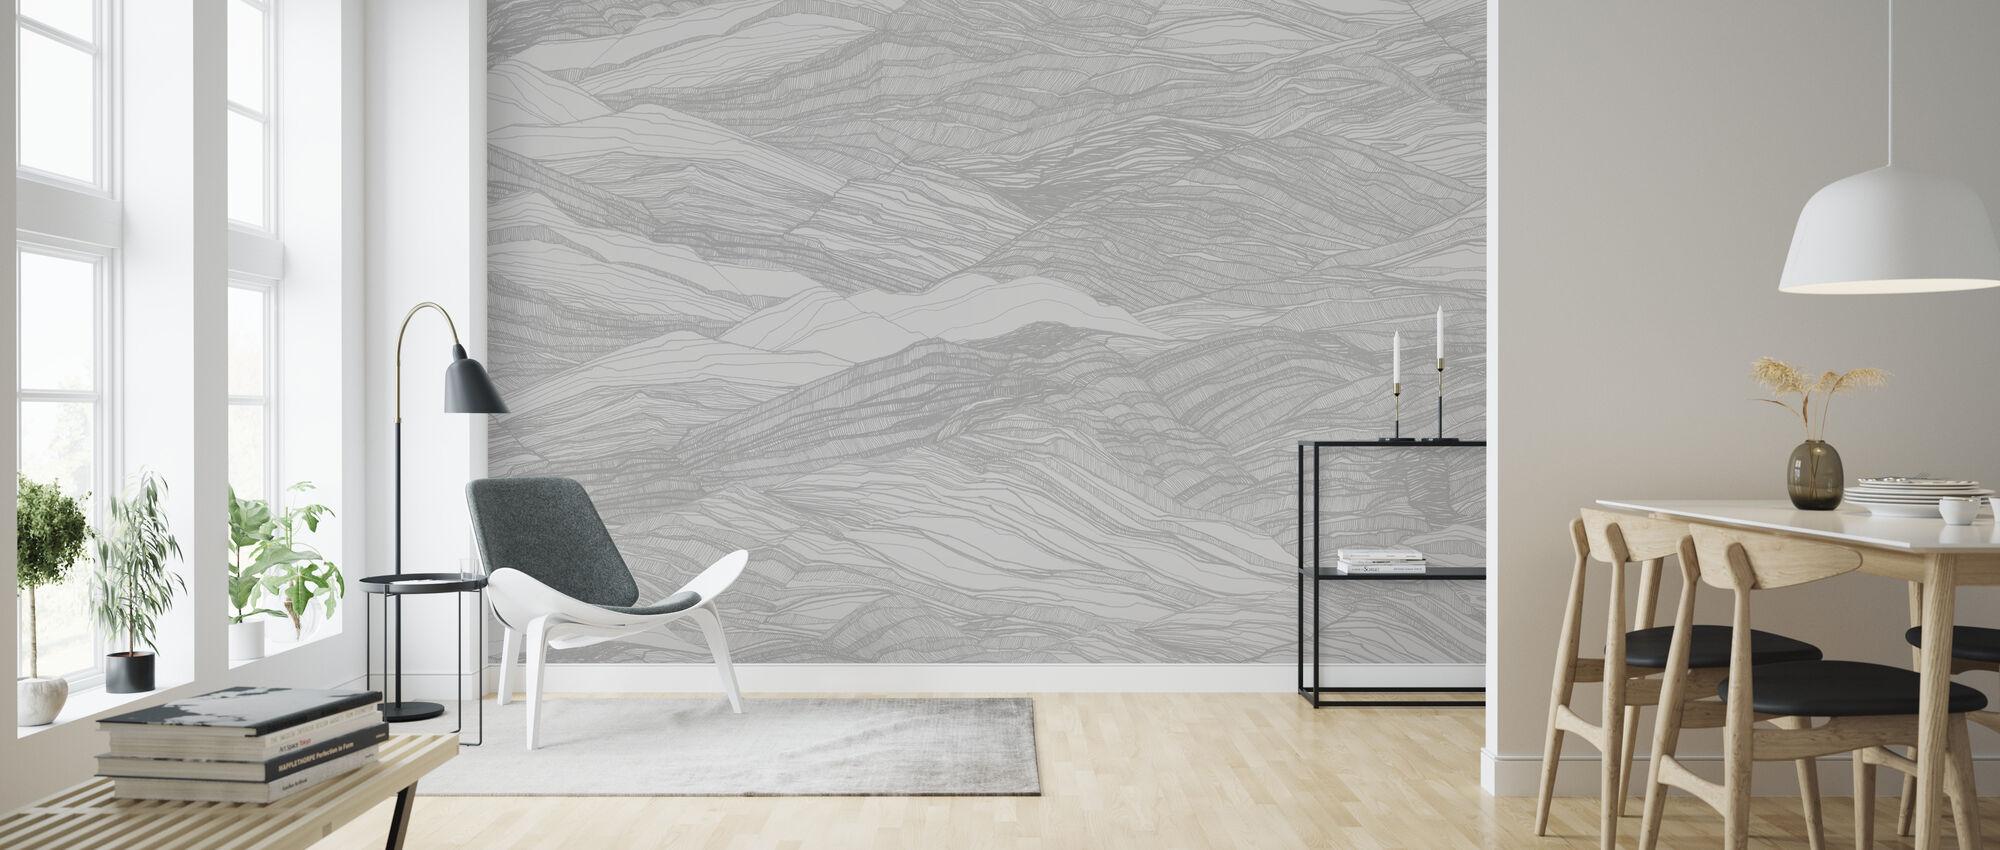 Duna Large - Raindrop - Wallpaper - Living Room